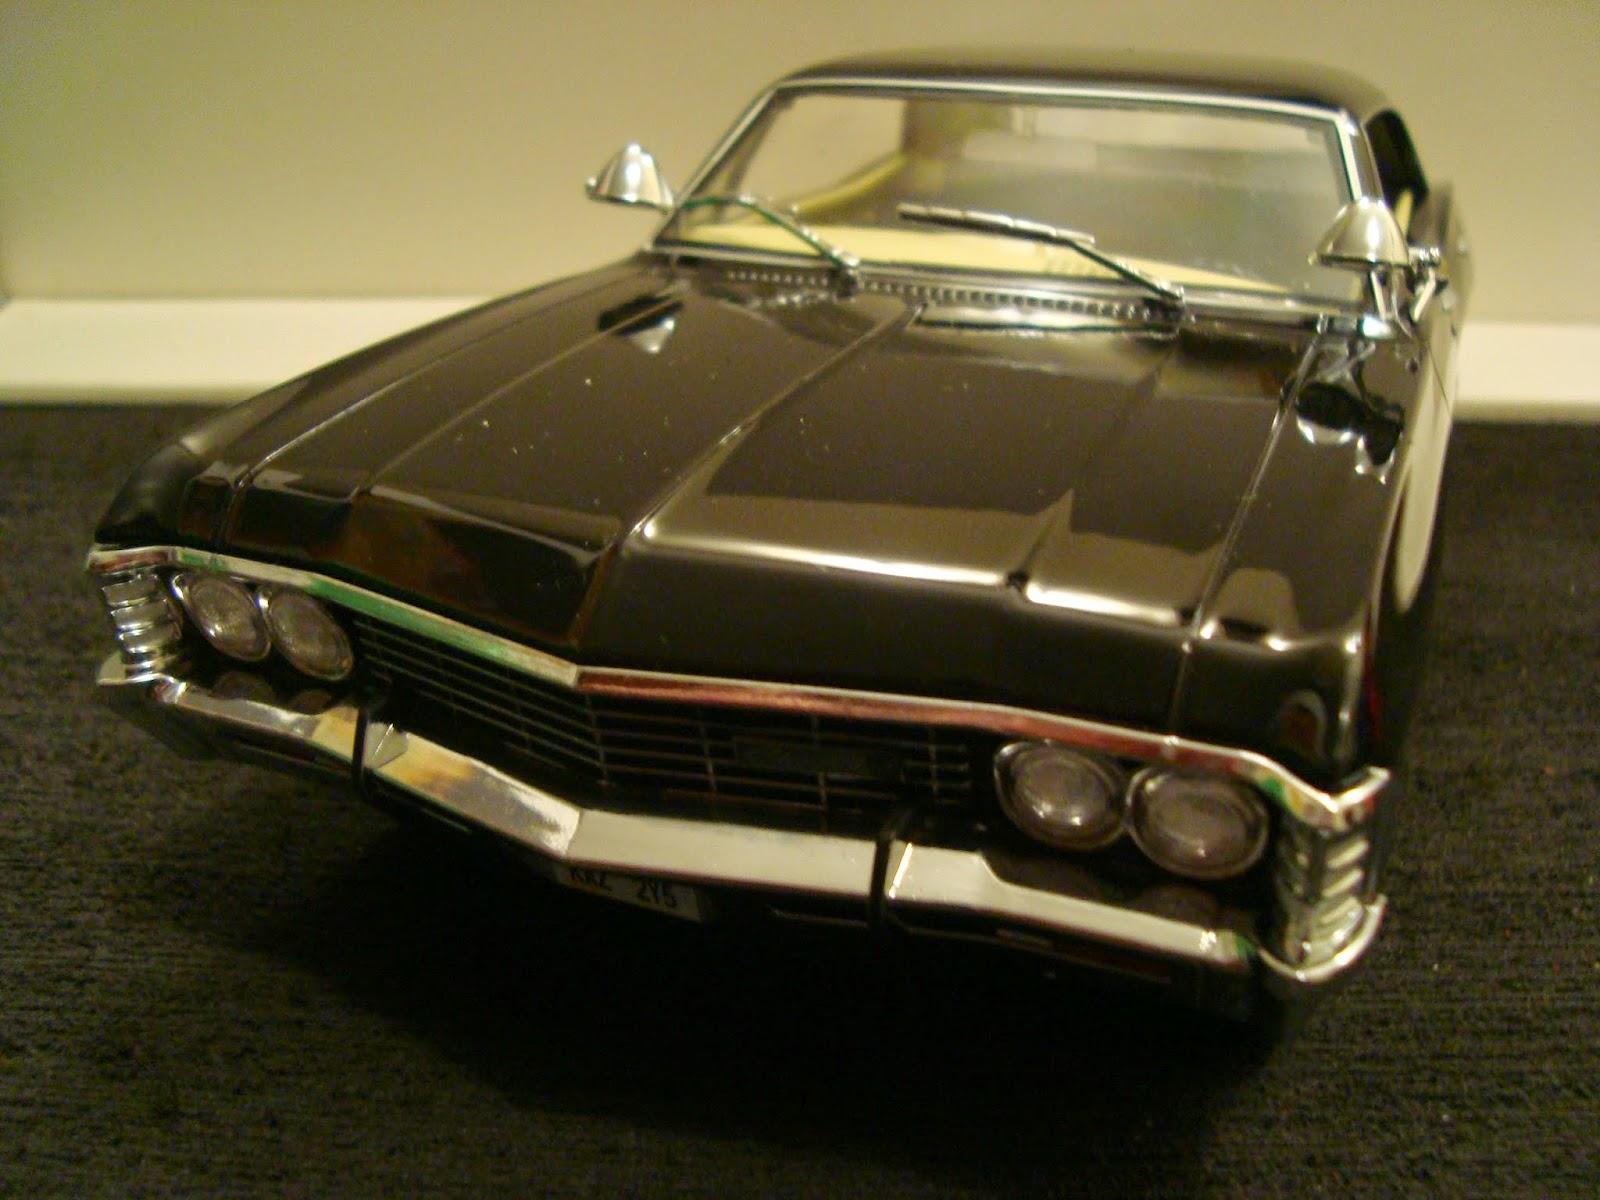 Diecast American Car Nutz!: 1967 Chevrolet Impala SS